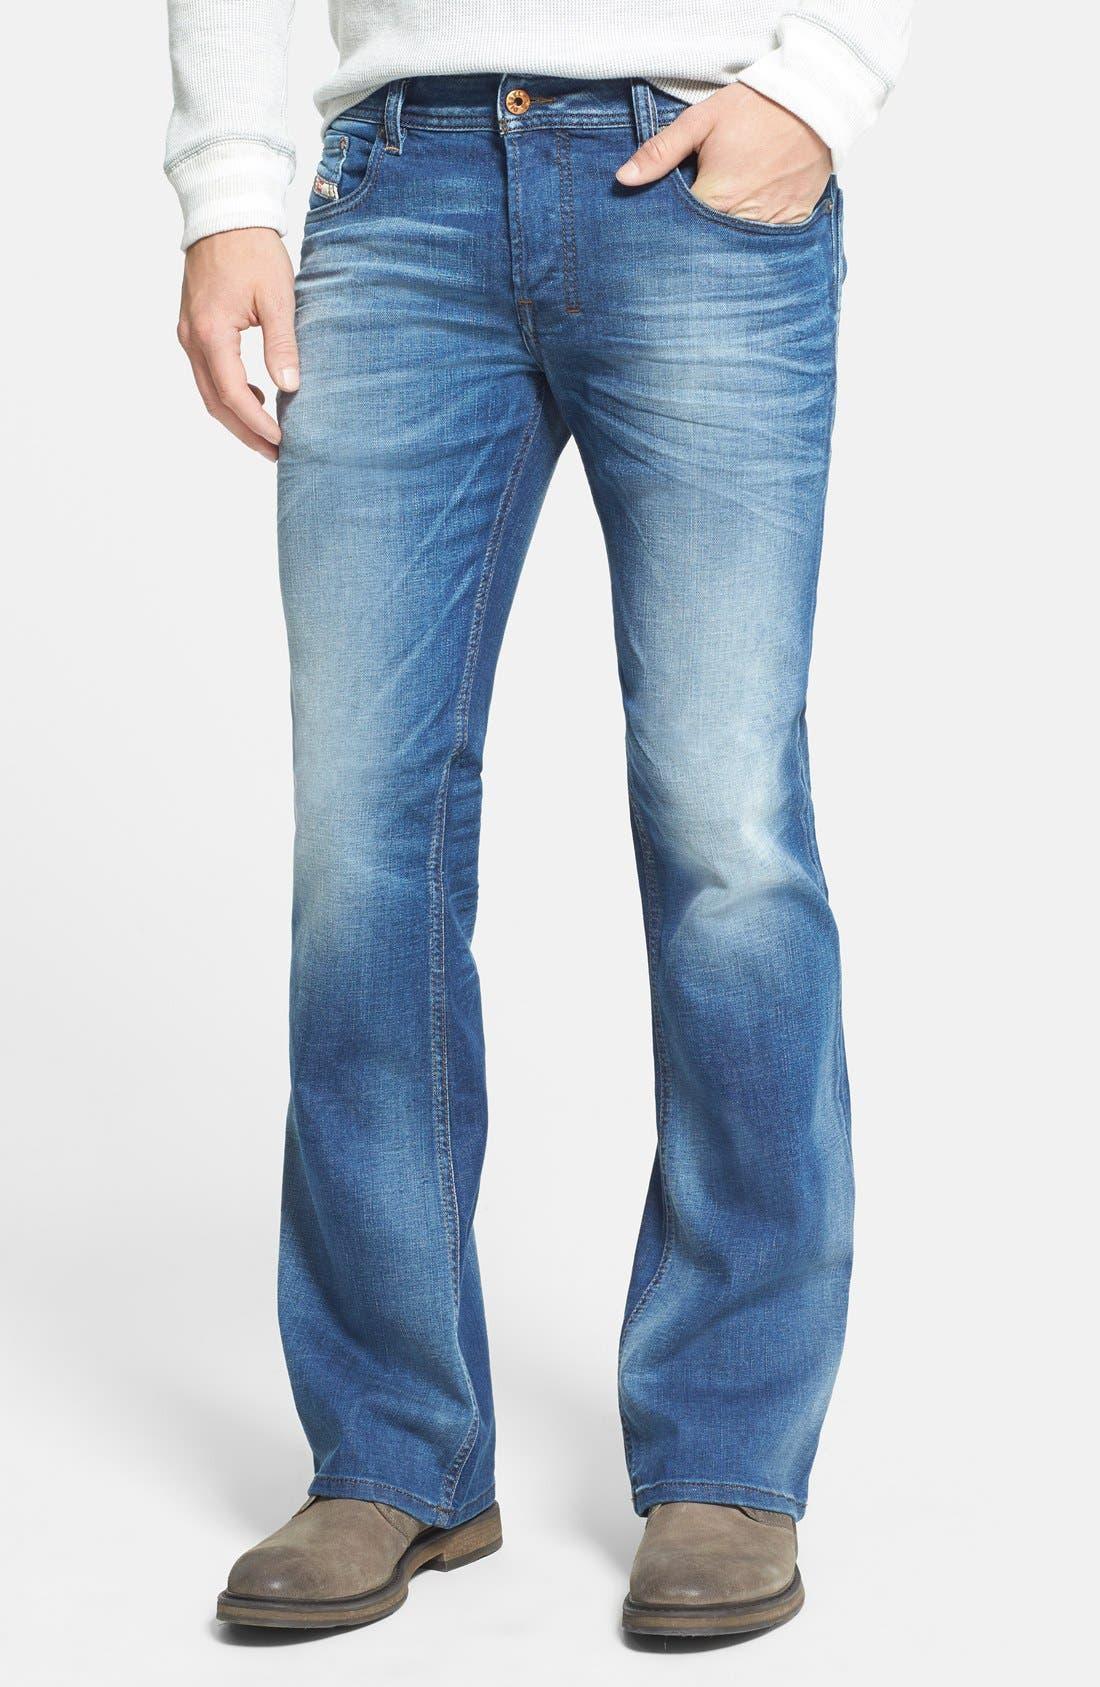 Zathan Bootcut Jeans,                         Main,                         color, 0831D